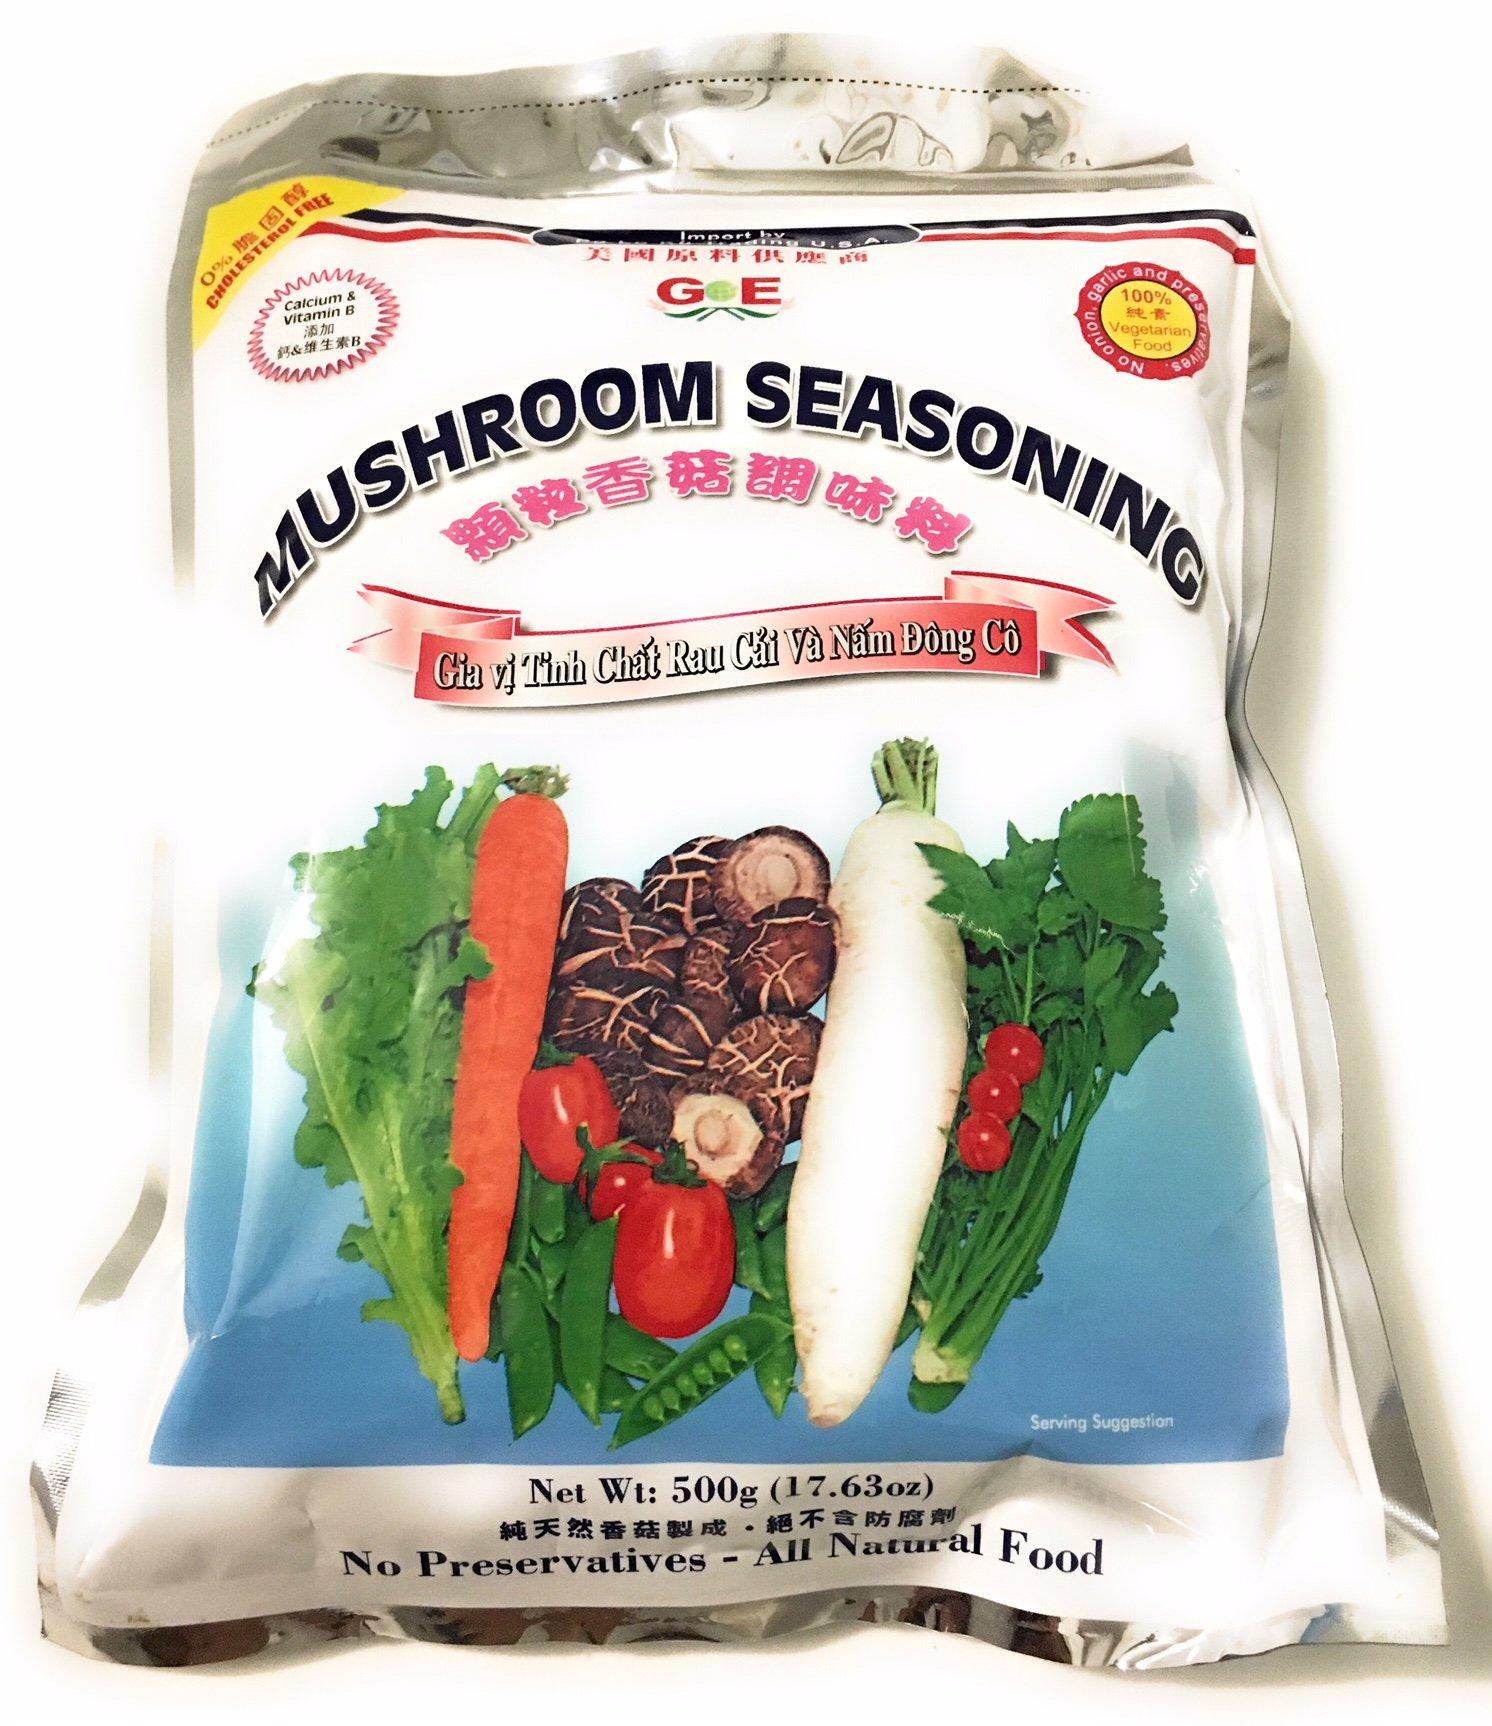 MUSHROOM SEASONING NATURAL GRANULE 17.63OZ (500g) by Po Lo Ku Trading USA